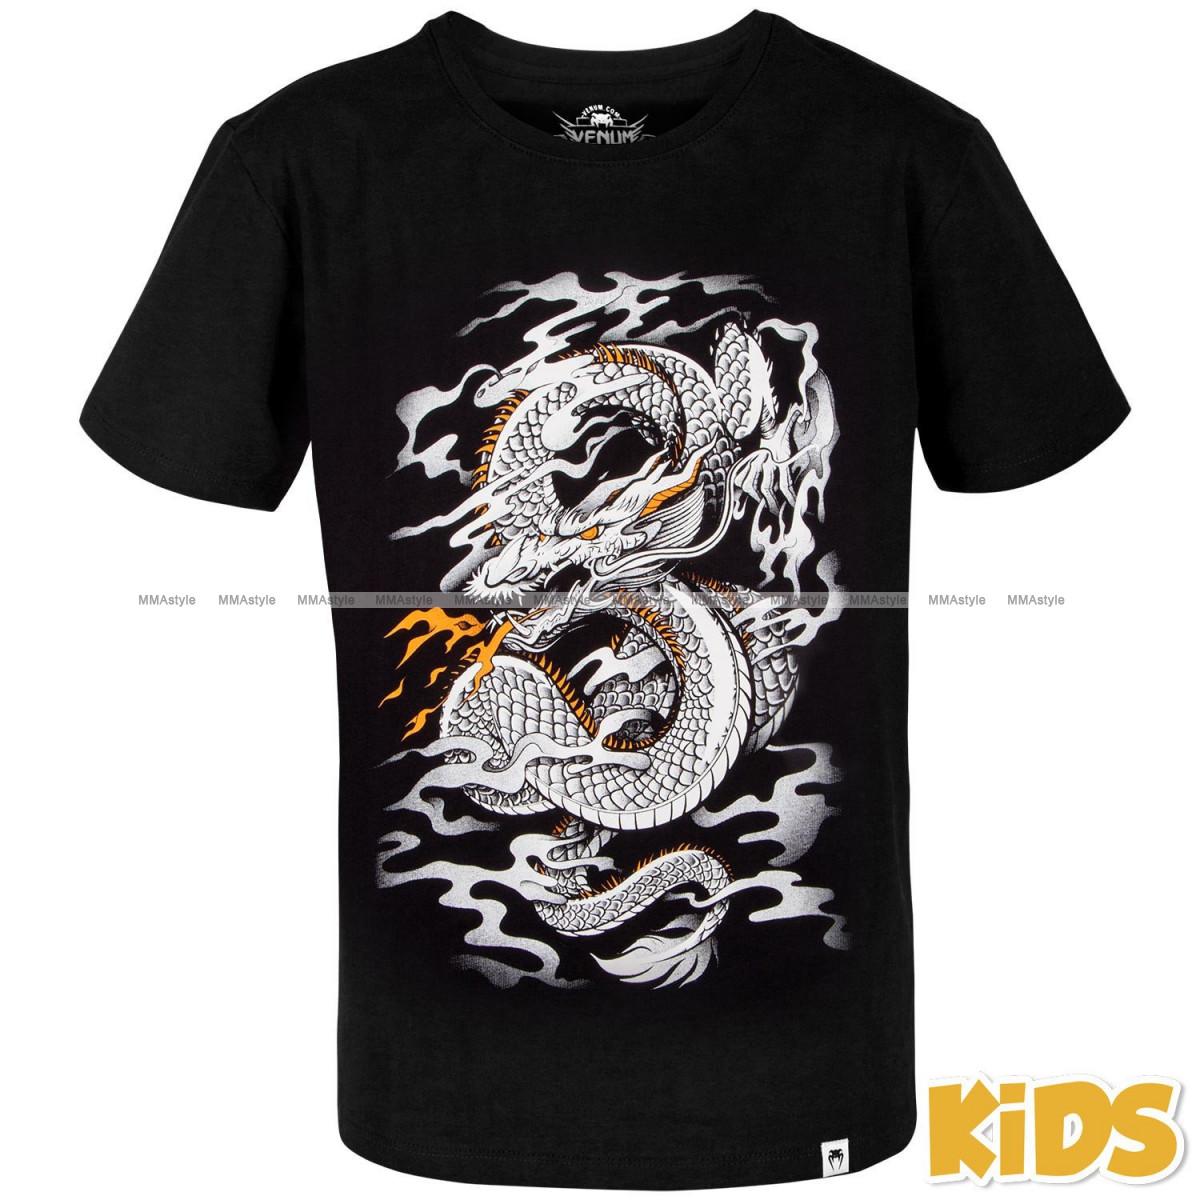 Детская футболка Venum Dragons Flight Kids T-shirt - Black